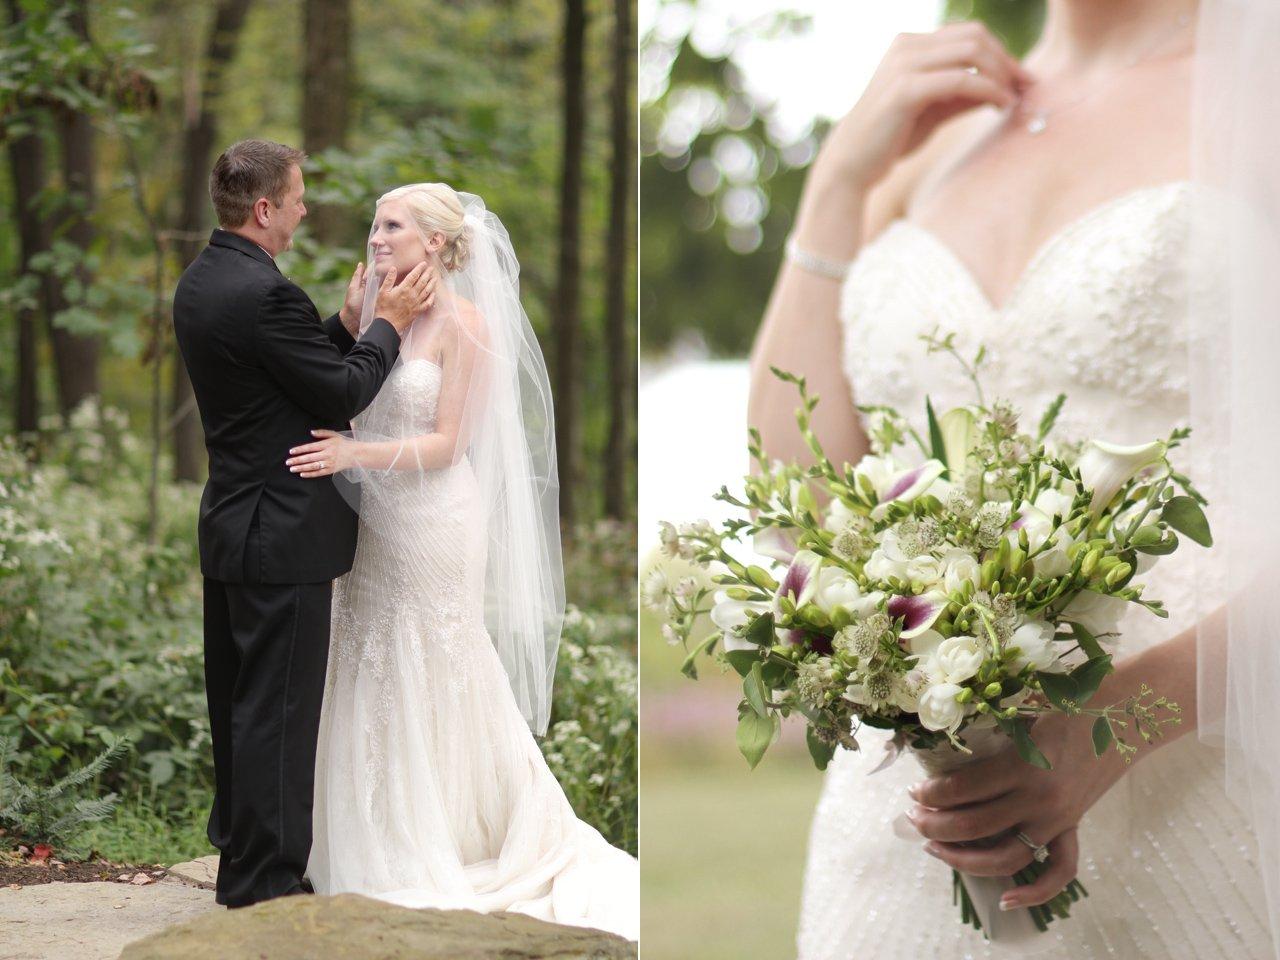 pittsburgh botanic garden wedding araujo photography. Black Bedroom Furniture Sets. Home Design Ideas